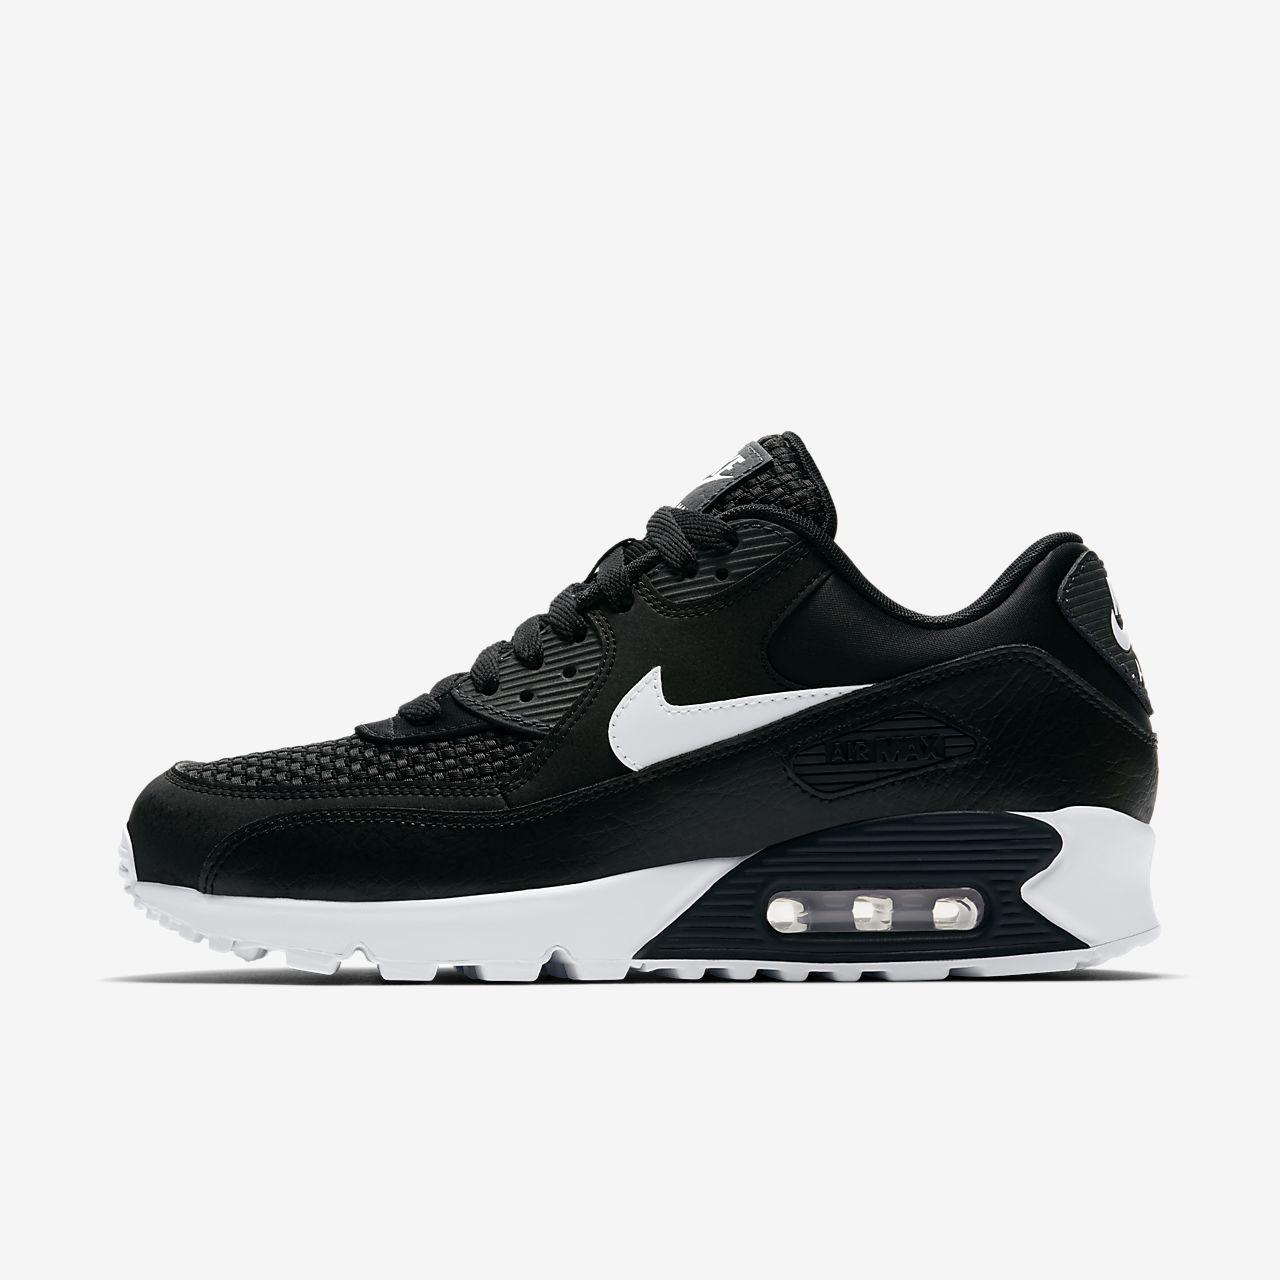 Air Max Nike ZERO NERA Premium bianco misura UK 8 9 10 sportive da corsa scarpe